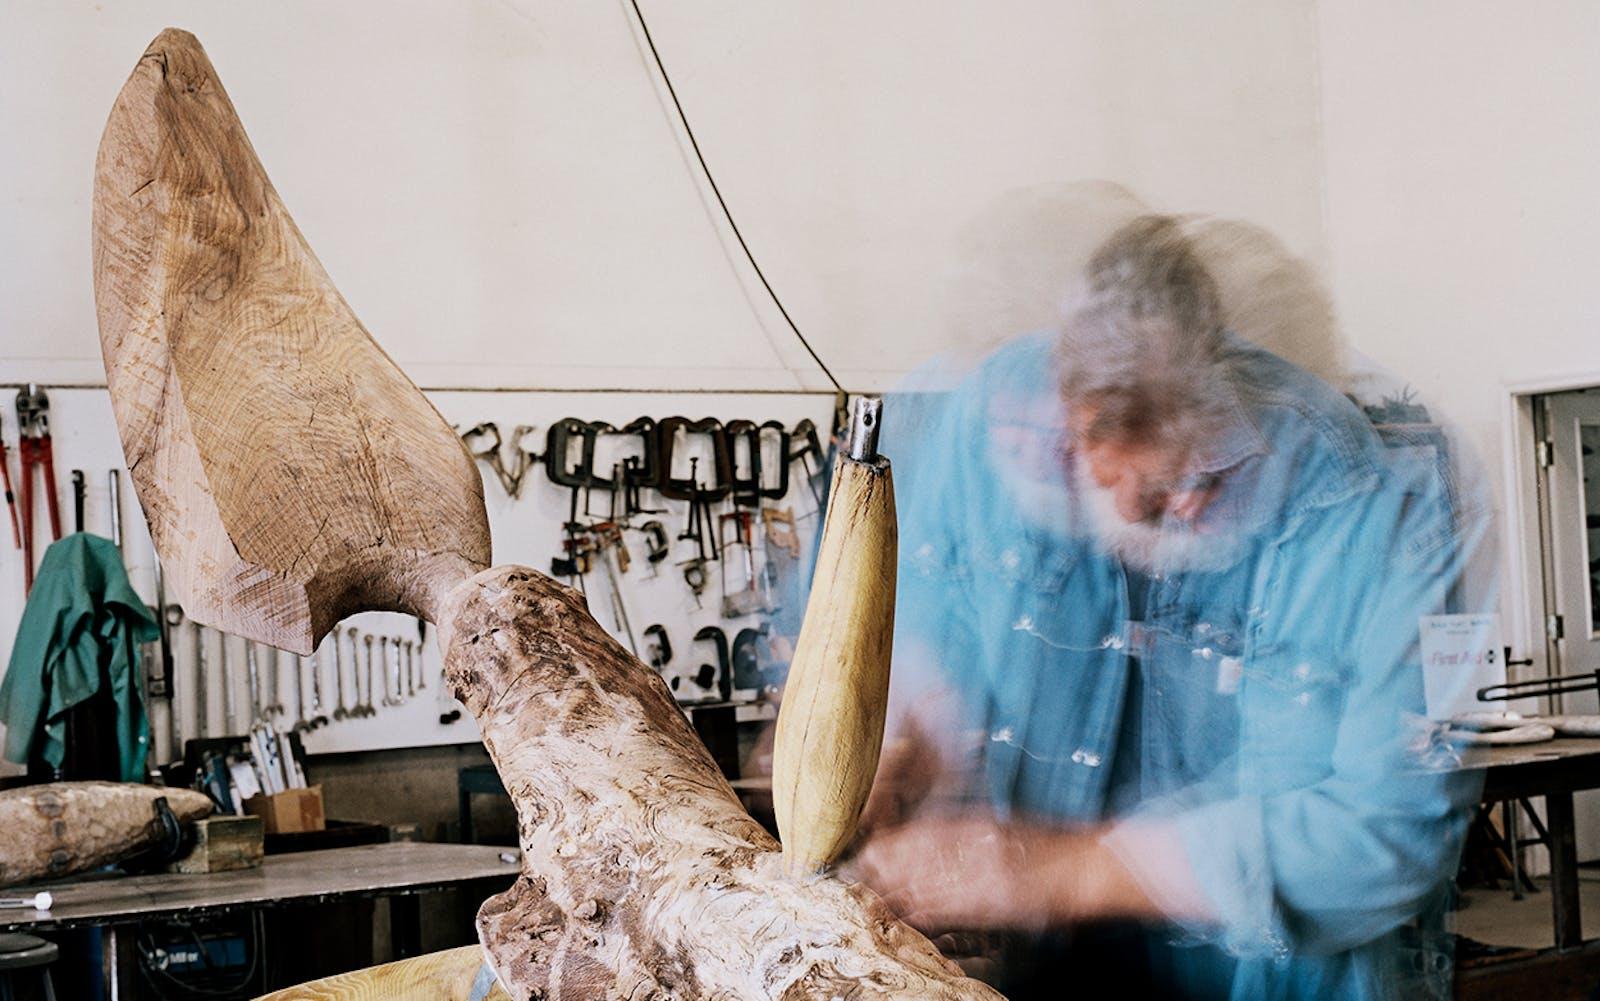 James Surls works on a wood sculpture titled